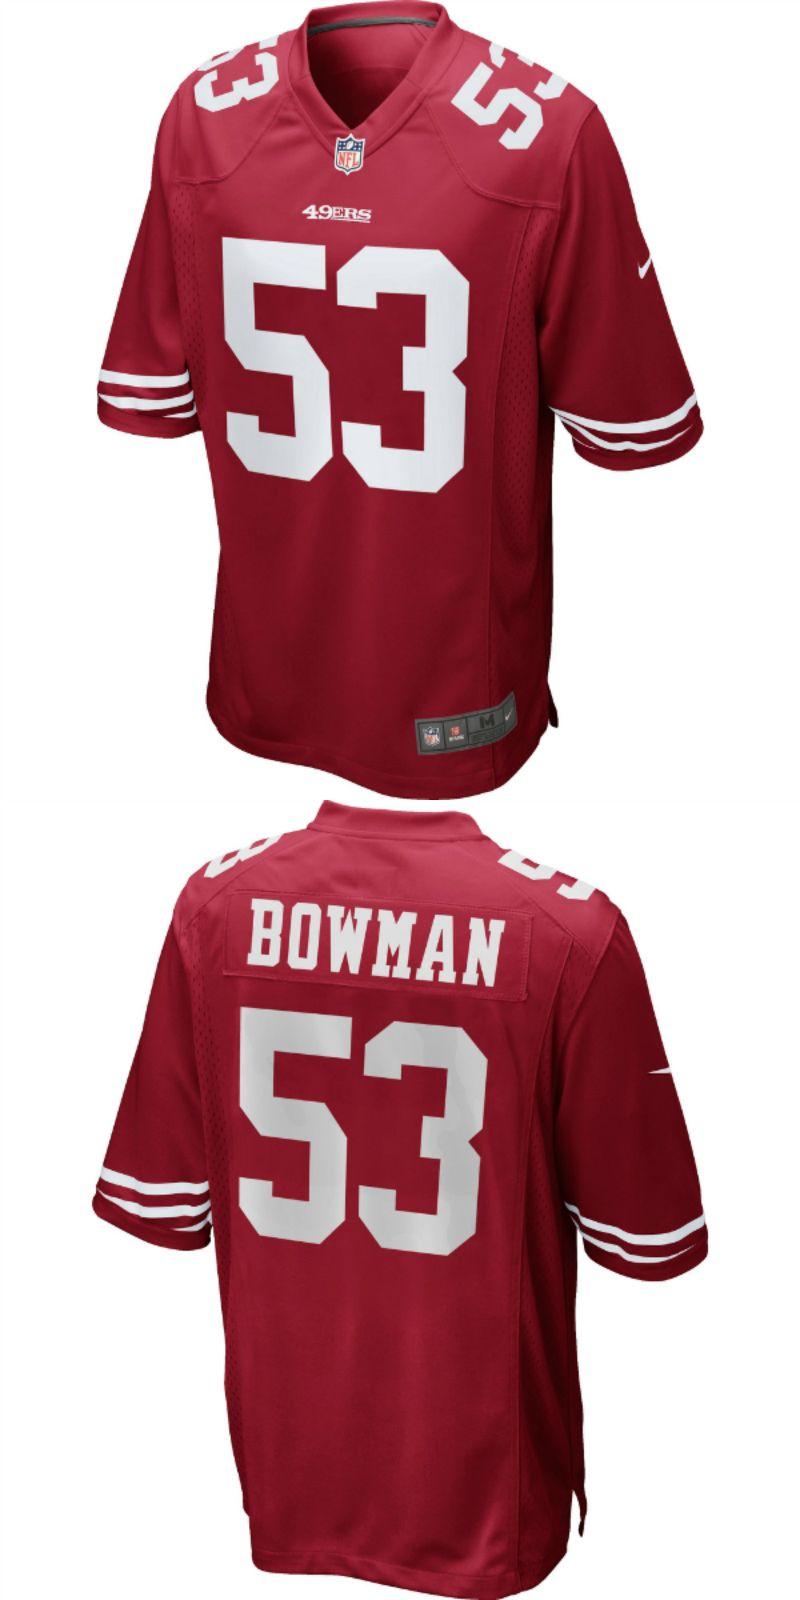 reputable site a210e 5f25d UP TO 70% OFF. NaVorro Bowman San Francisco 49ers Nike Vapor ...